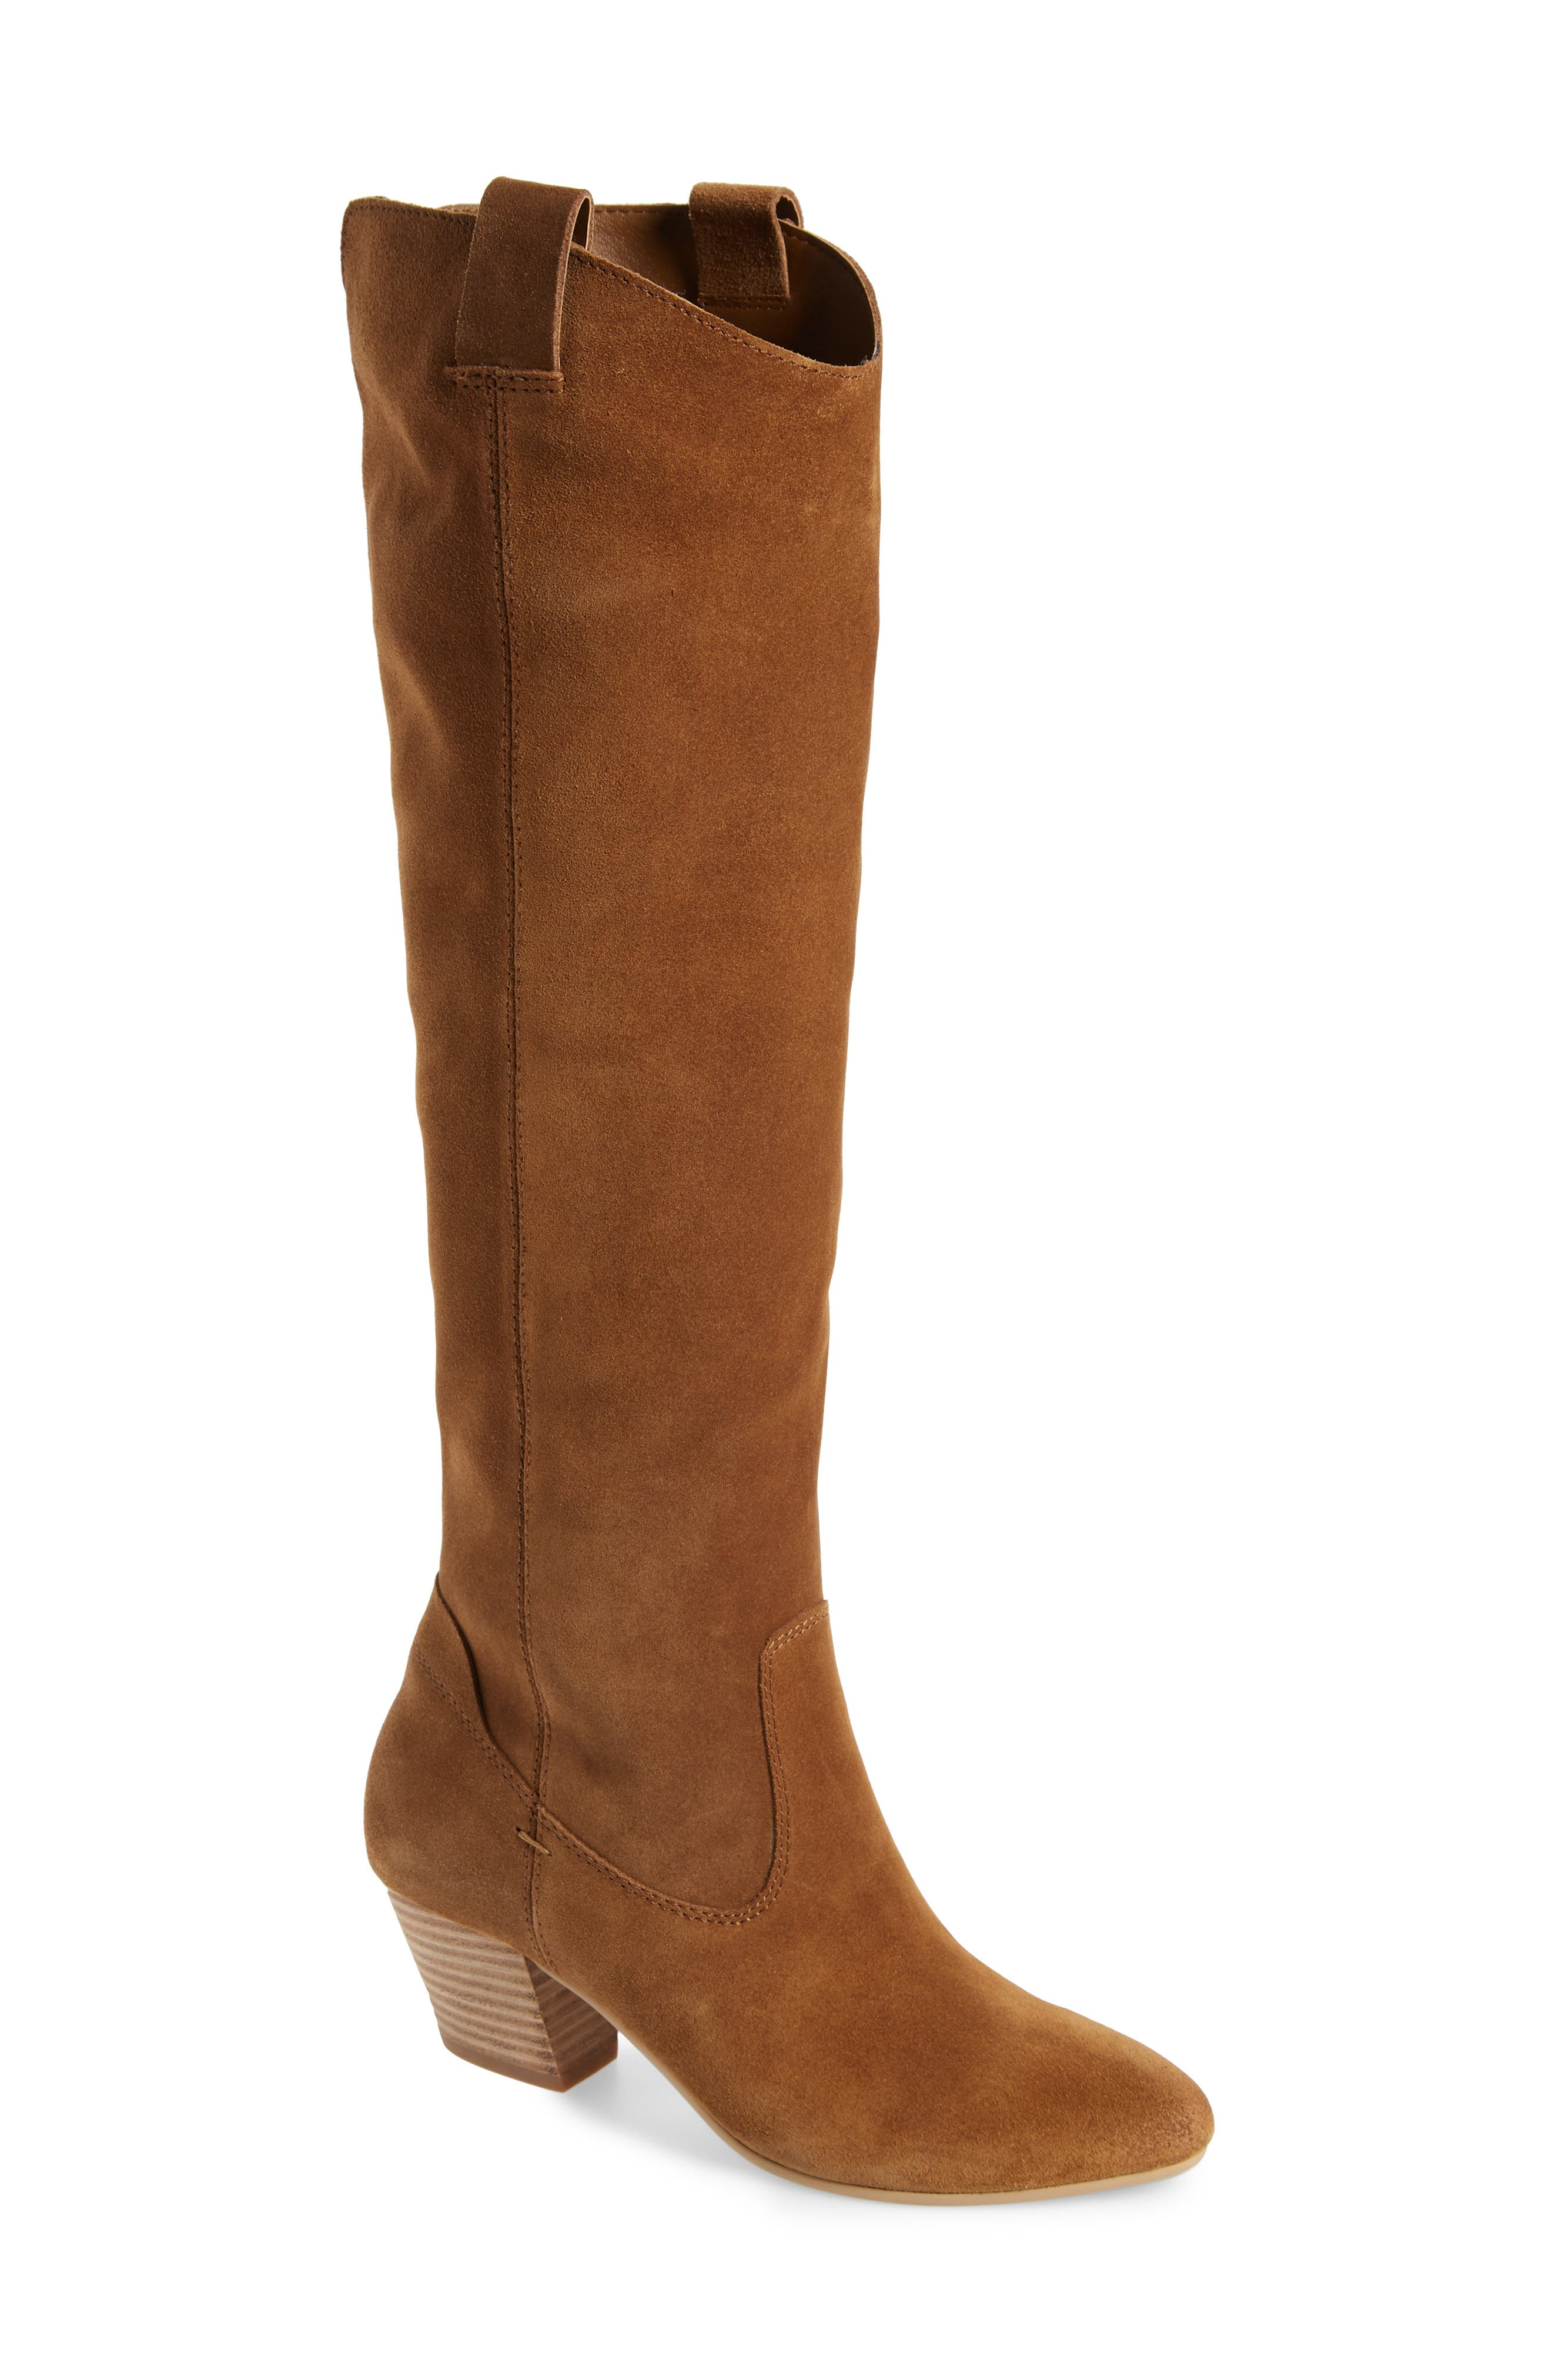 Dolce Vita Hinley Knee High Boot- Brown